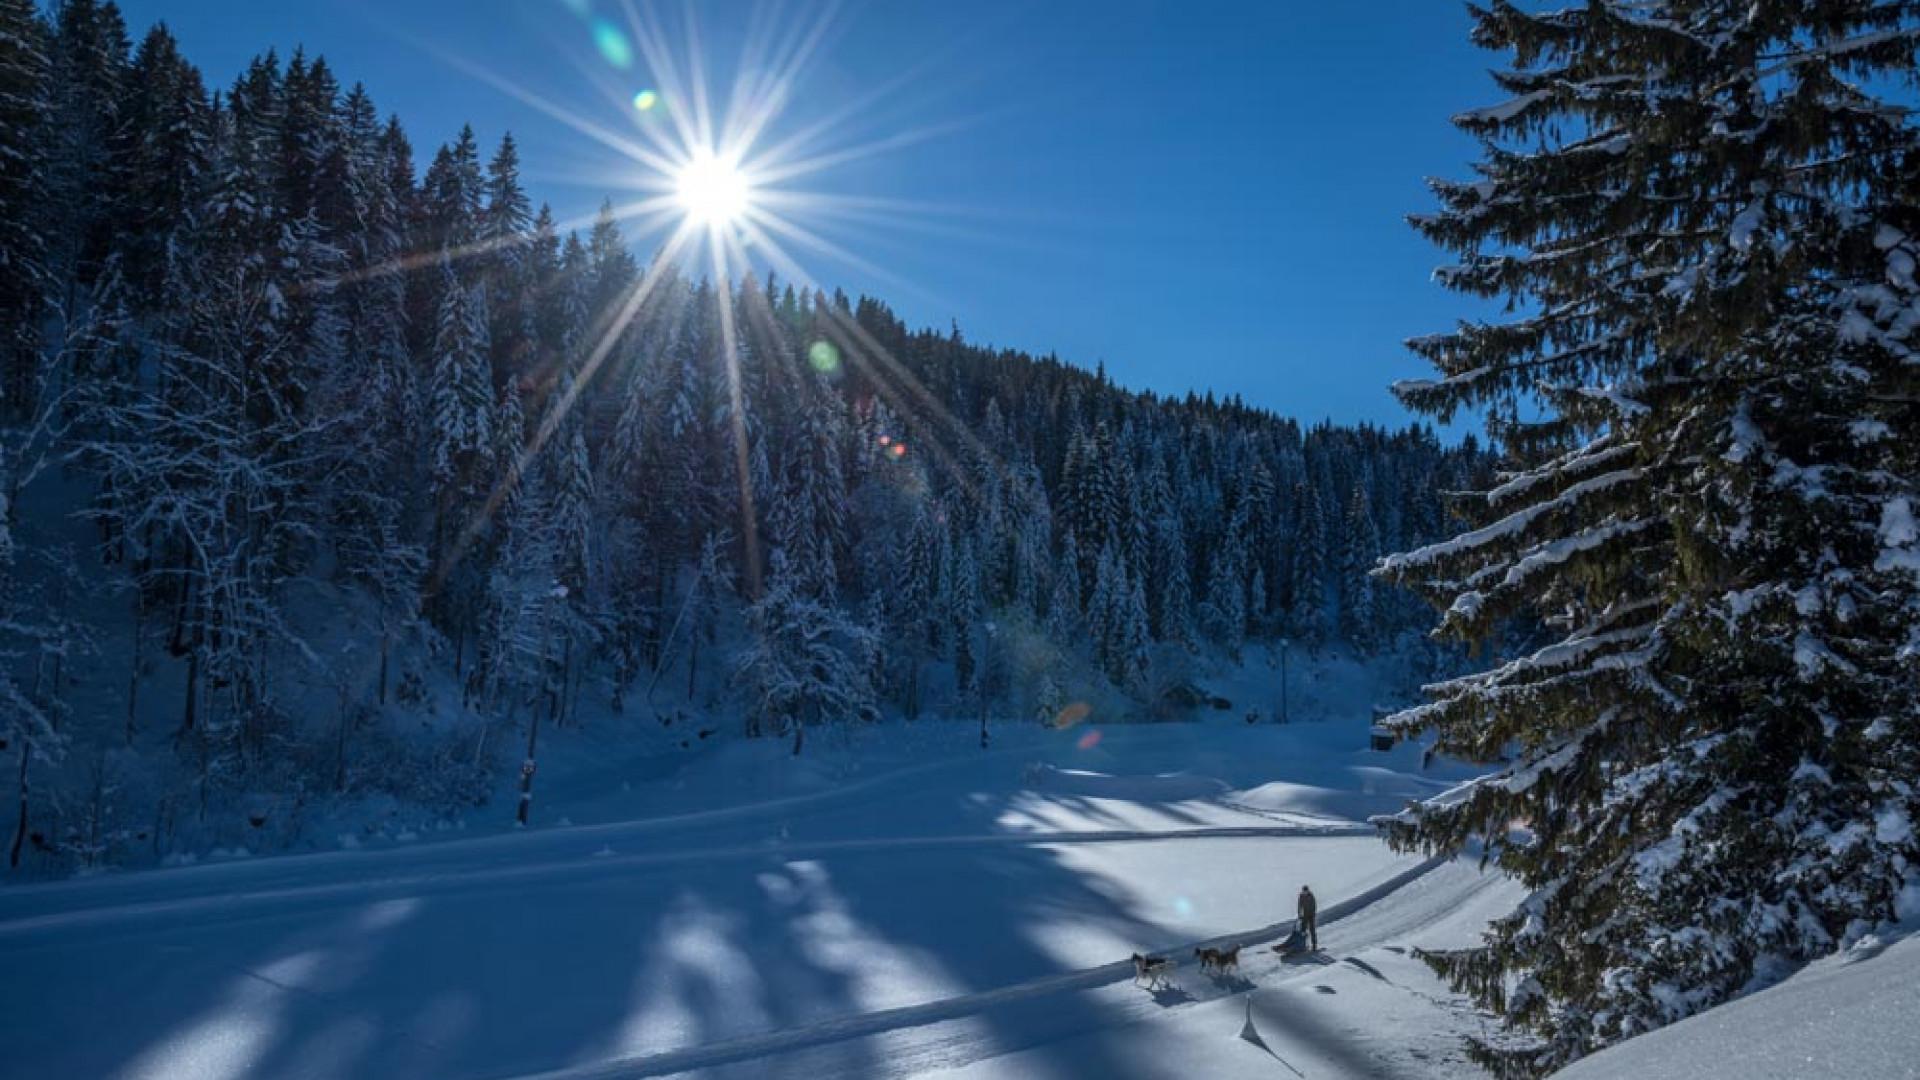 Piste at Alphotel, Austria